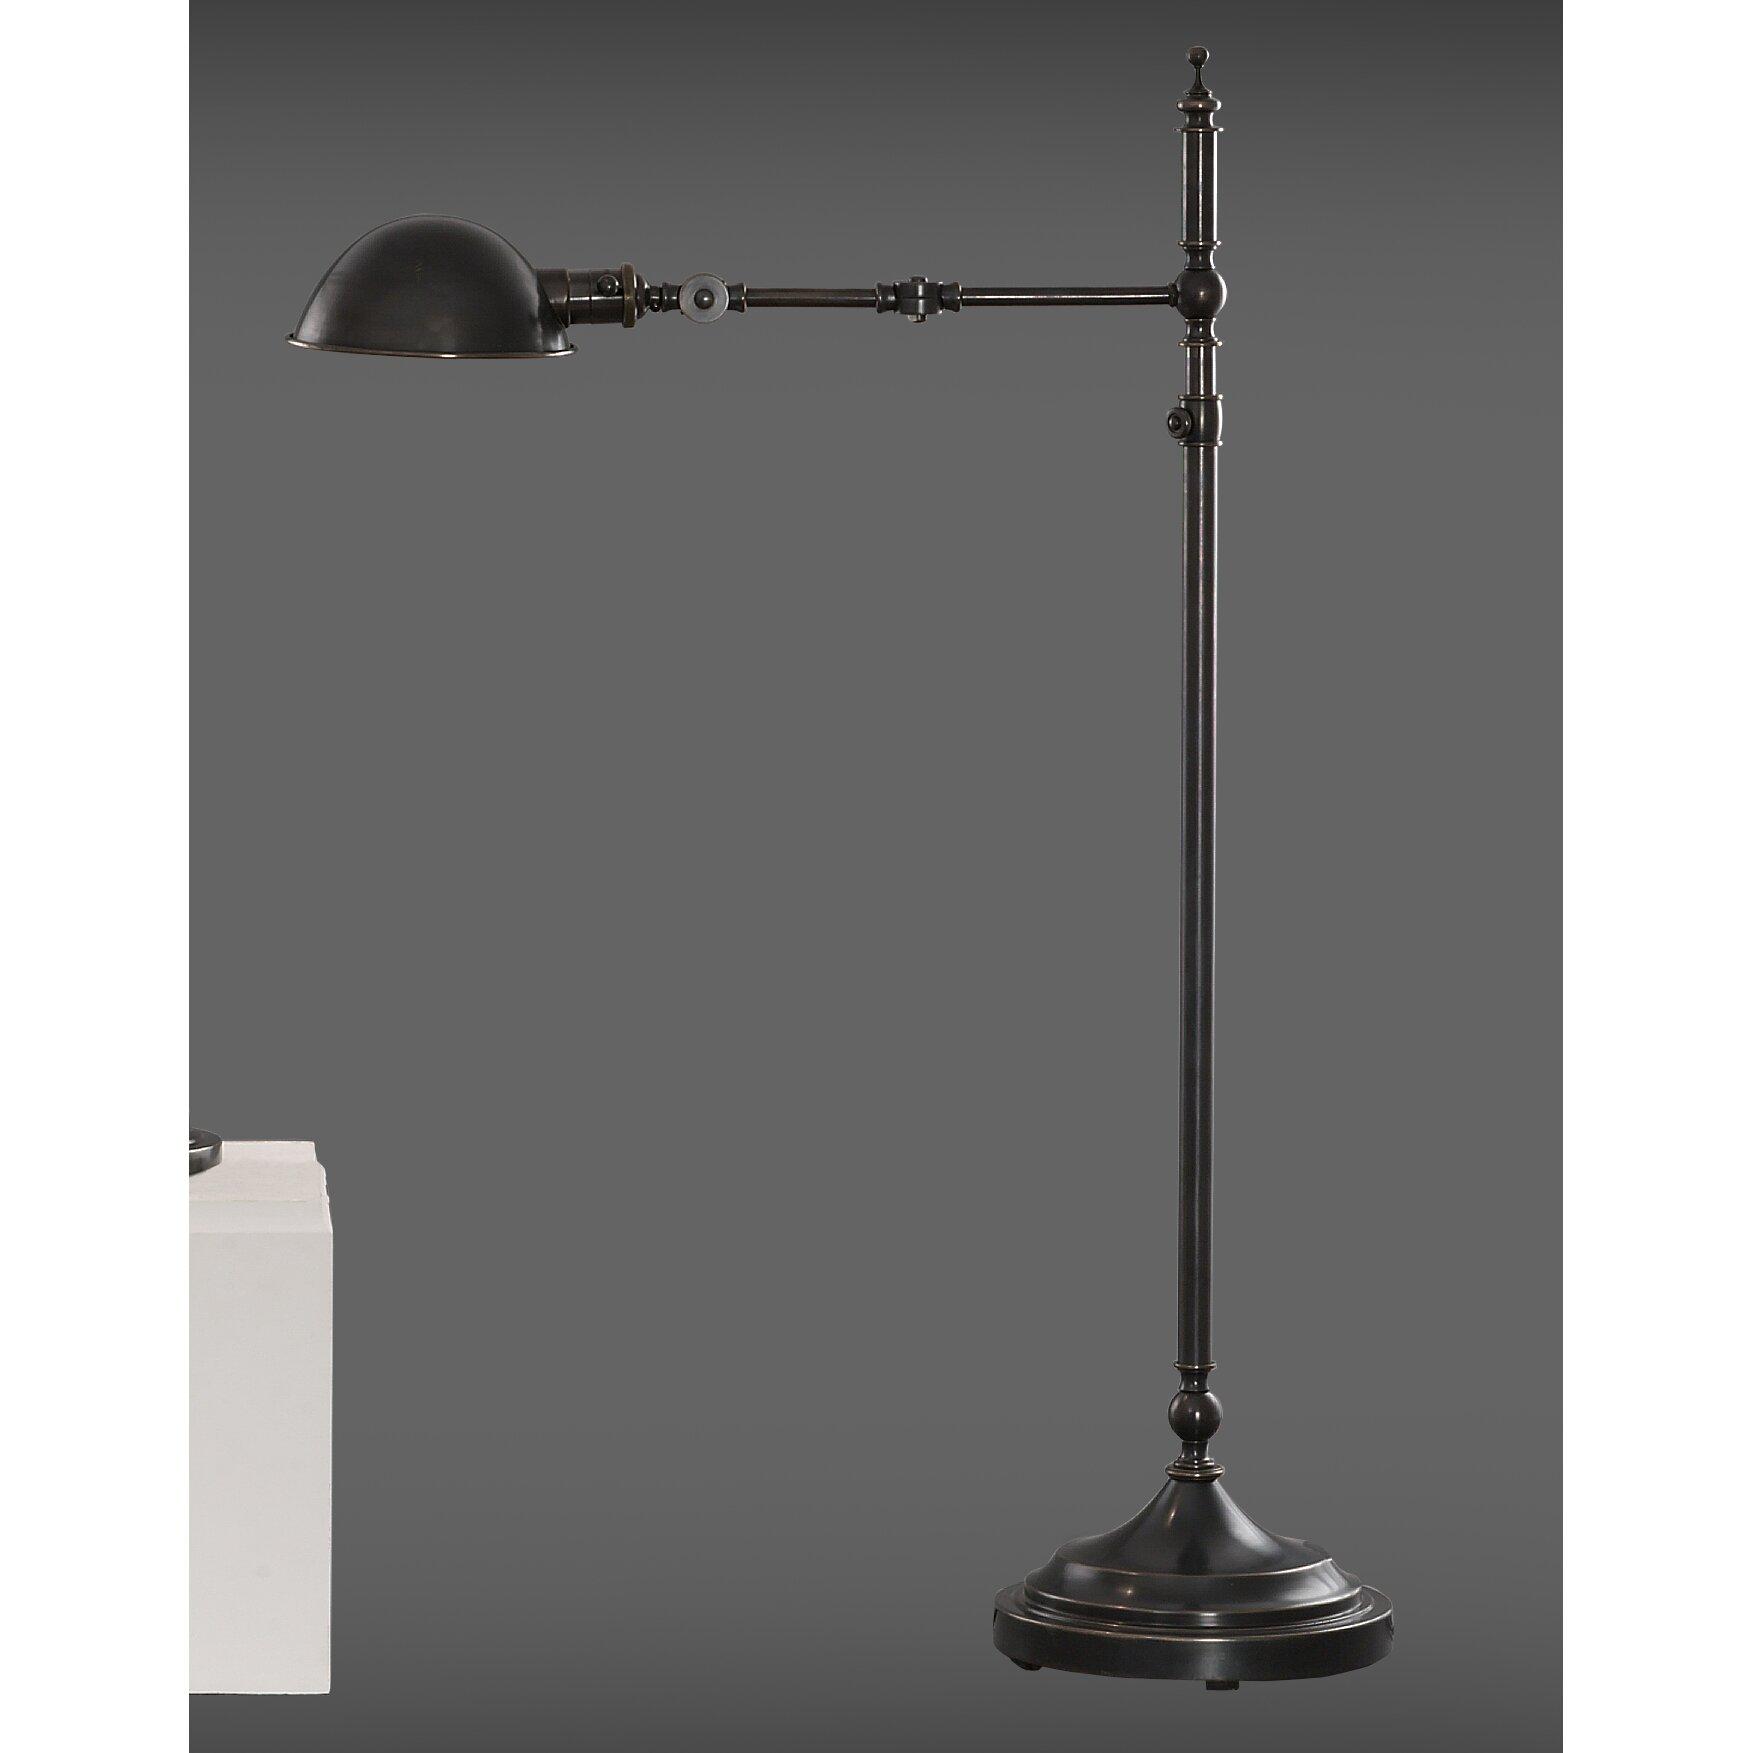 robert abbey ant bee pharmacy 50 task floor lamp. Black Bedroom Furniture Sets. Home Design Ideas